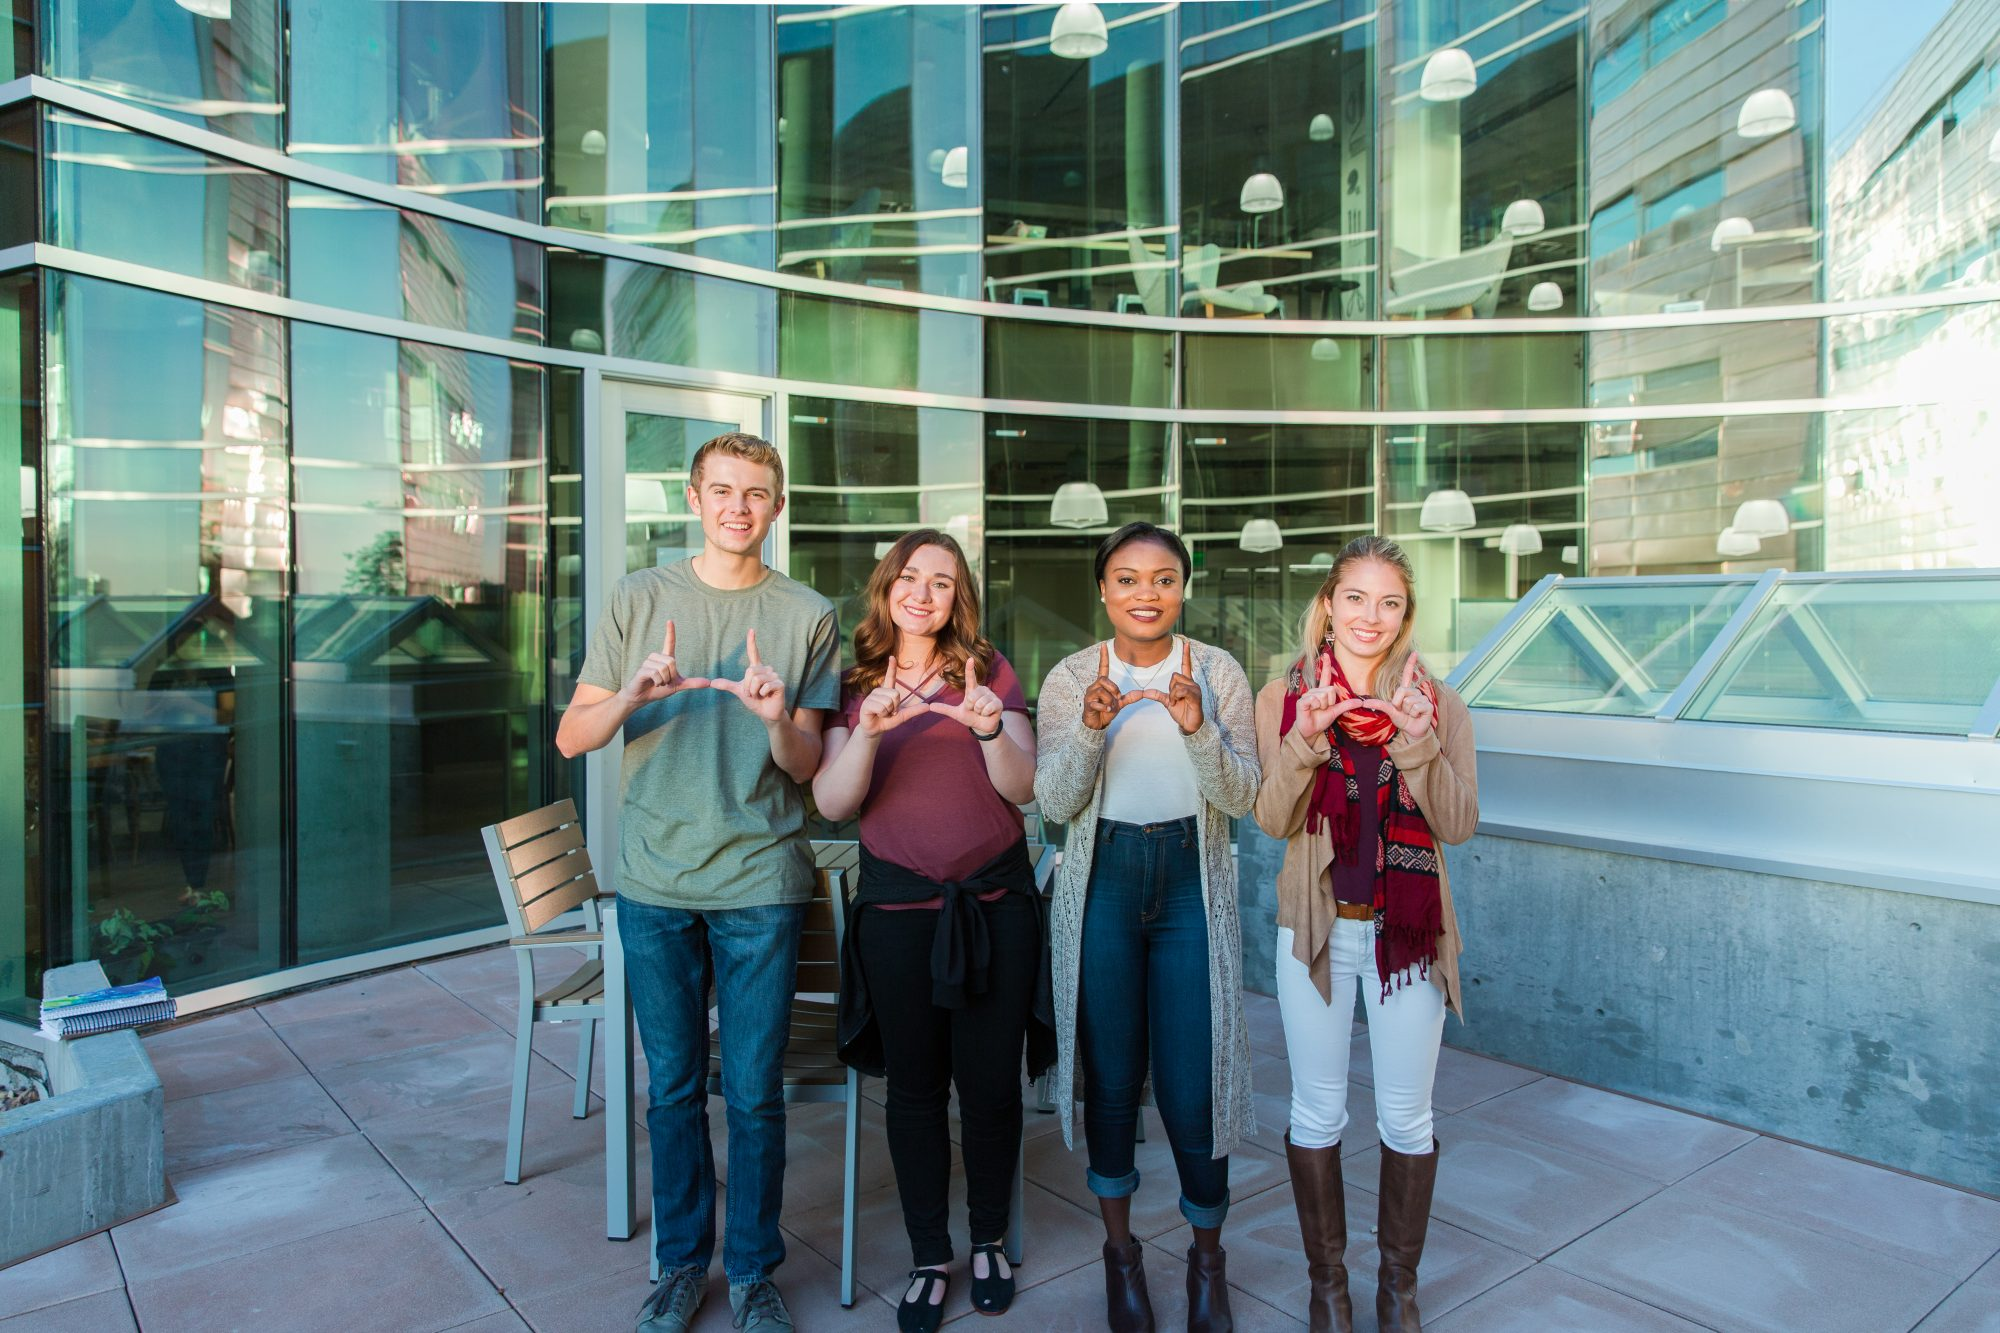 Students flashing the block U